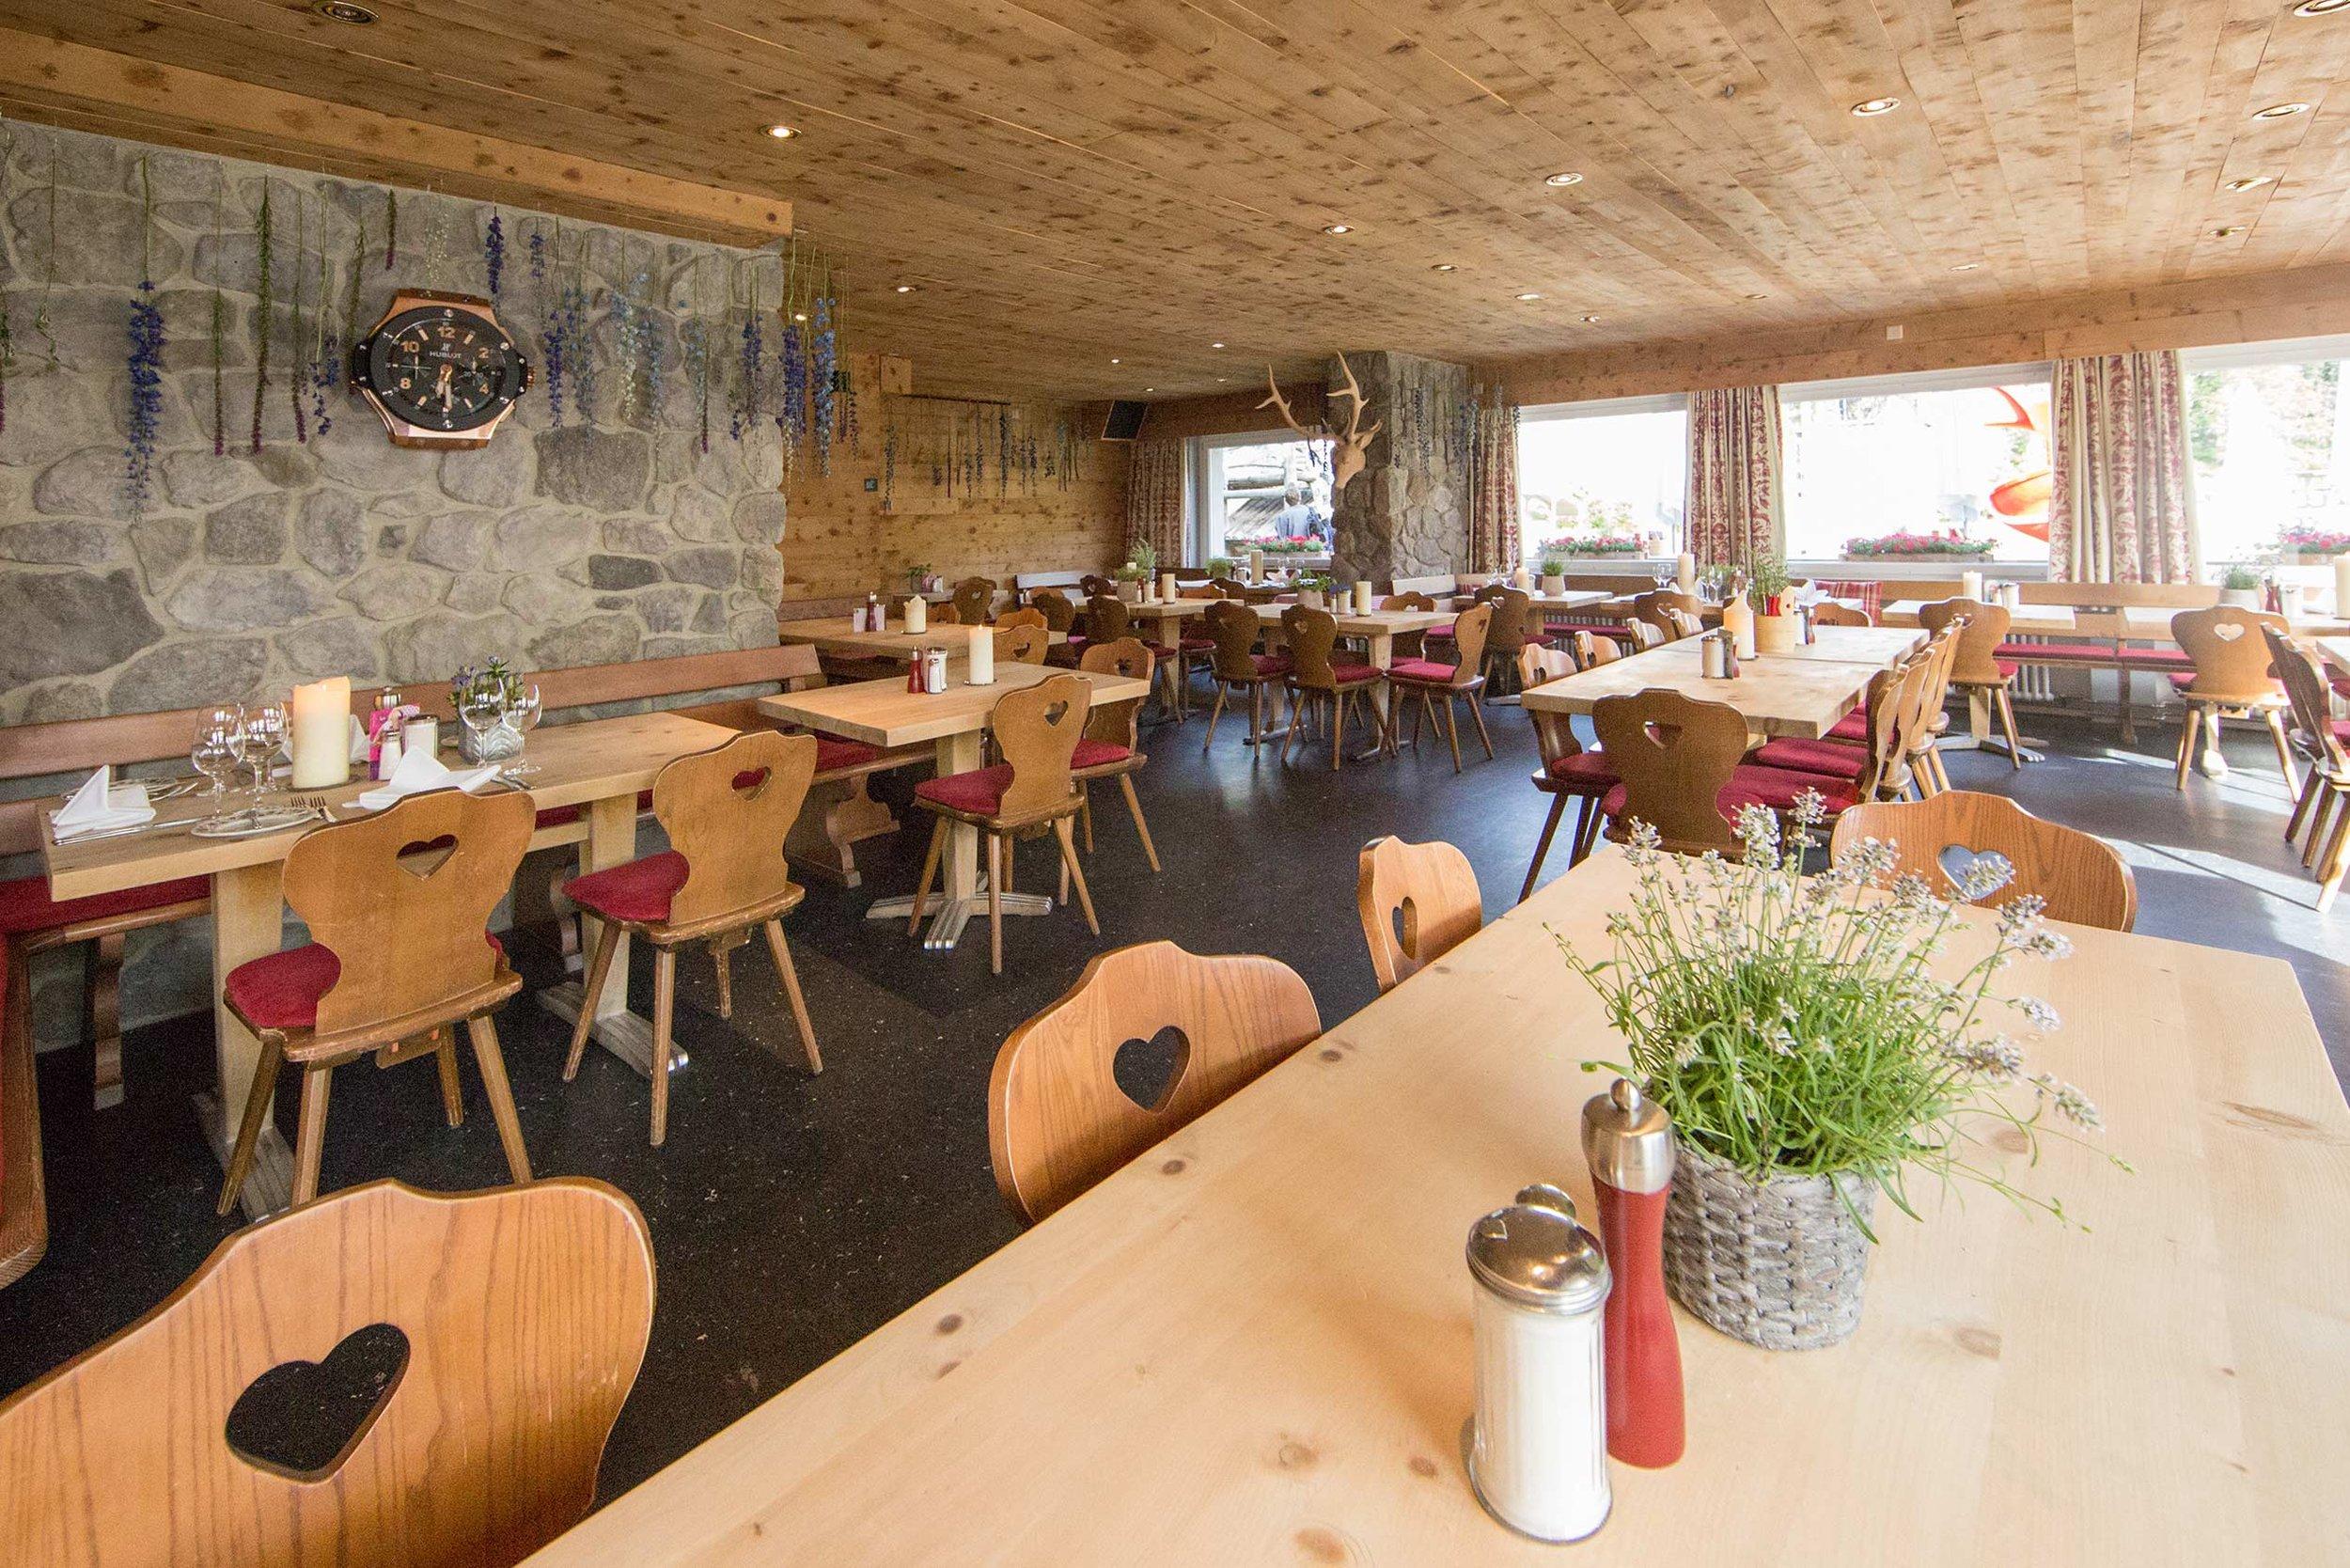 lejdastaz-restorant-am-tag-2.jpg